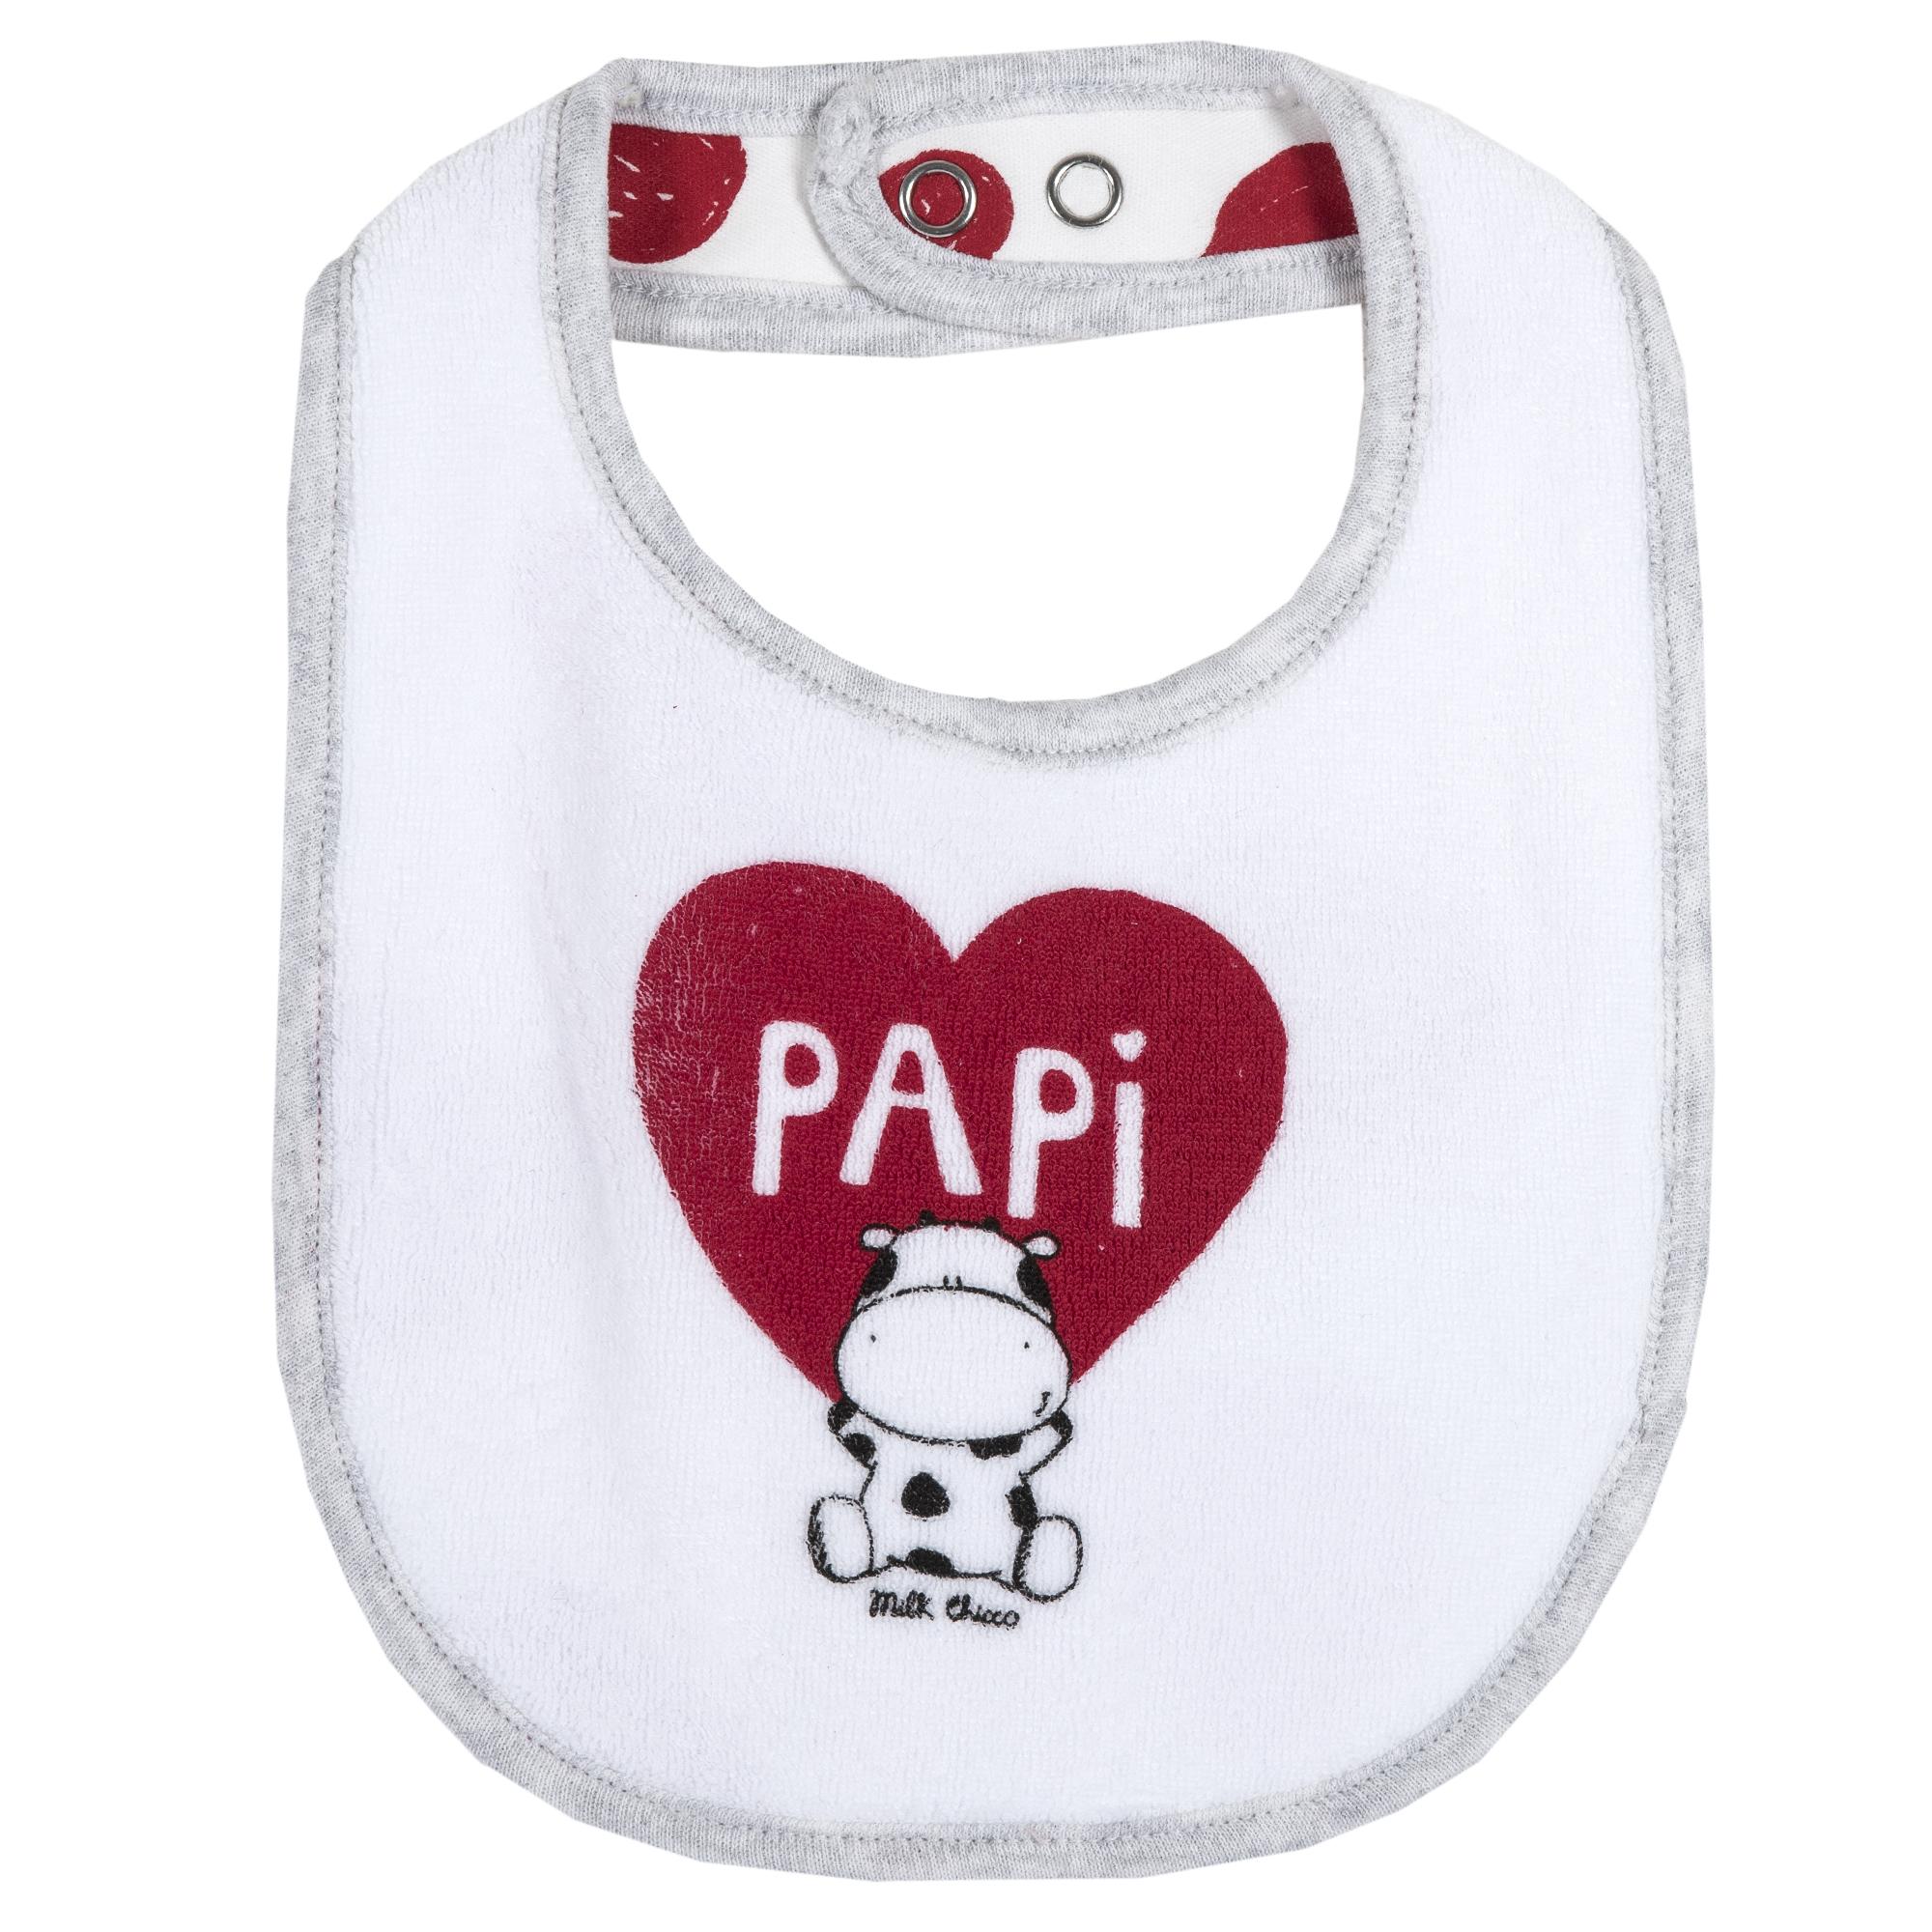 "Baveta copii Chicco, alb, ""PAPI"", 32716 din categoria Bavete"